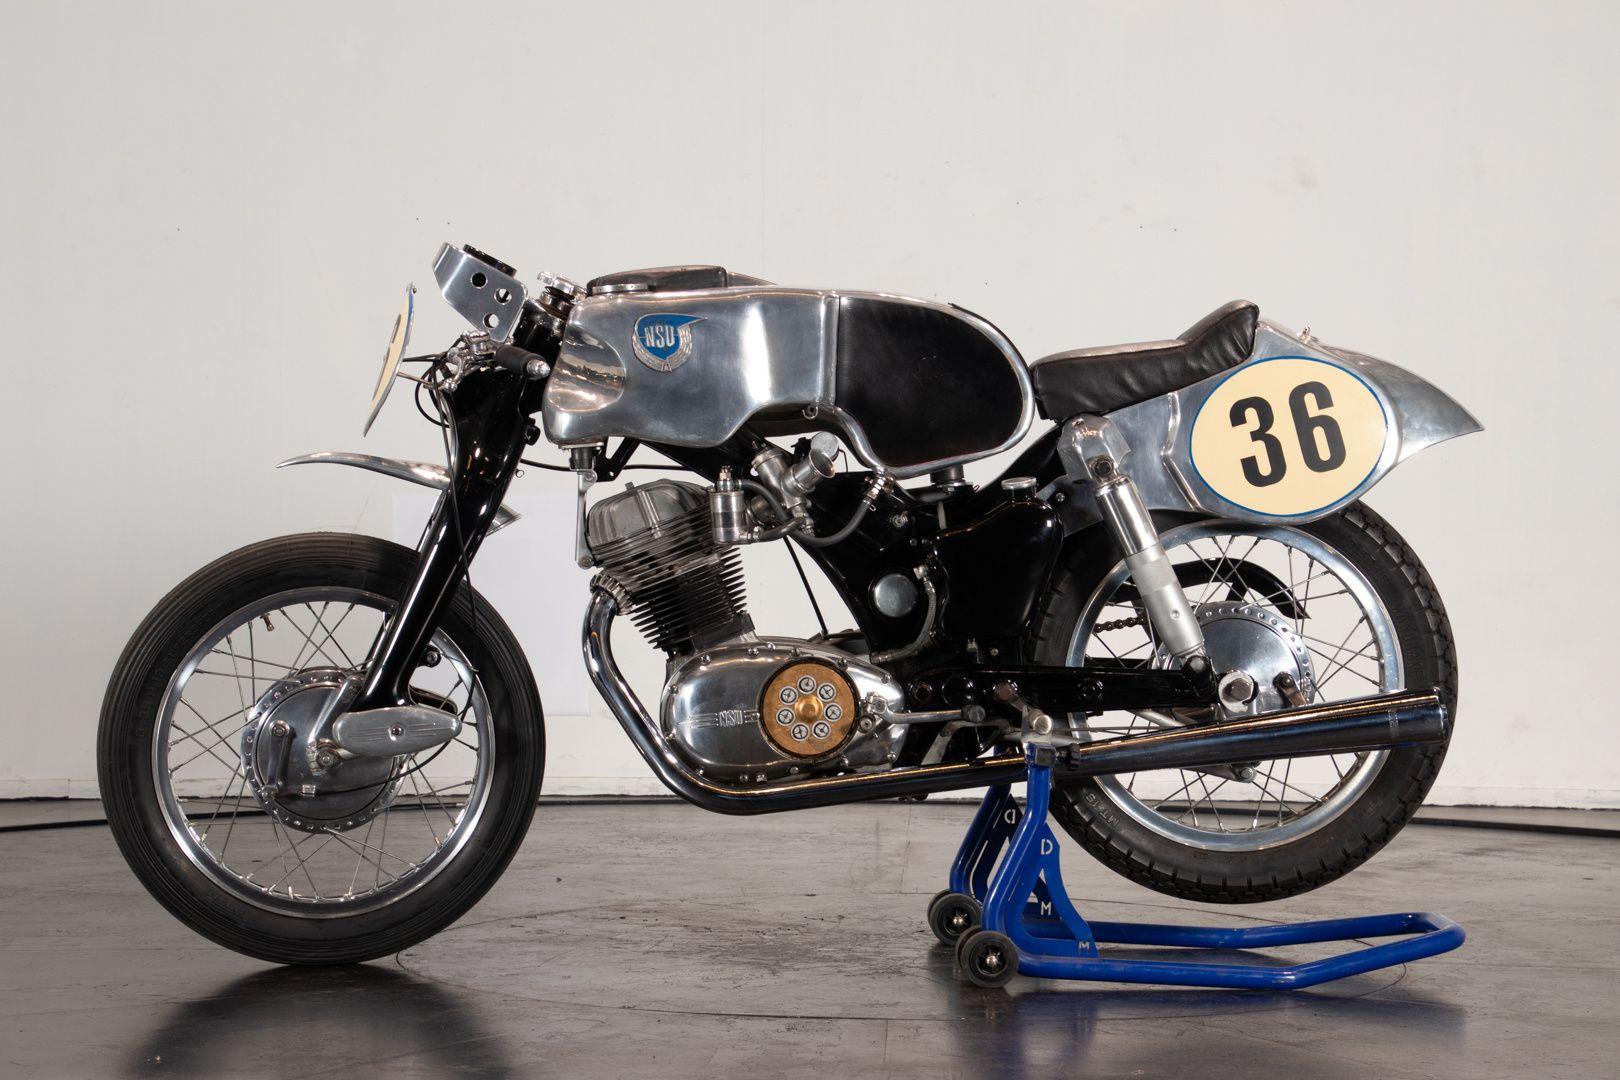 1954 Nsu Osl 251